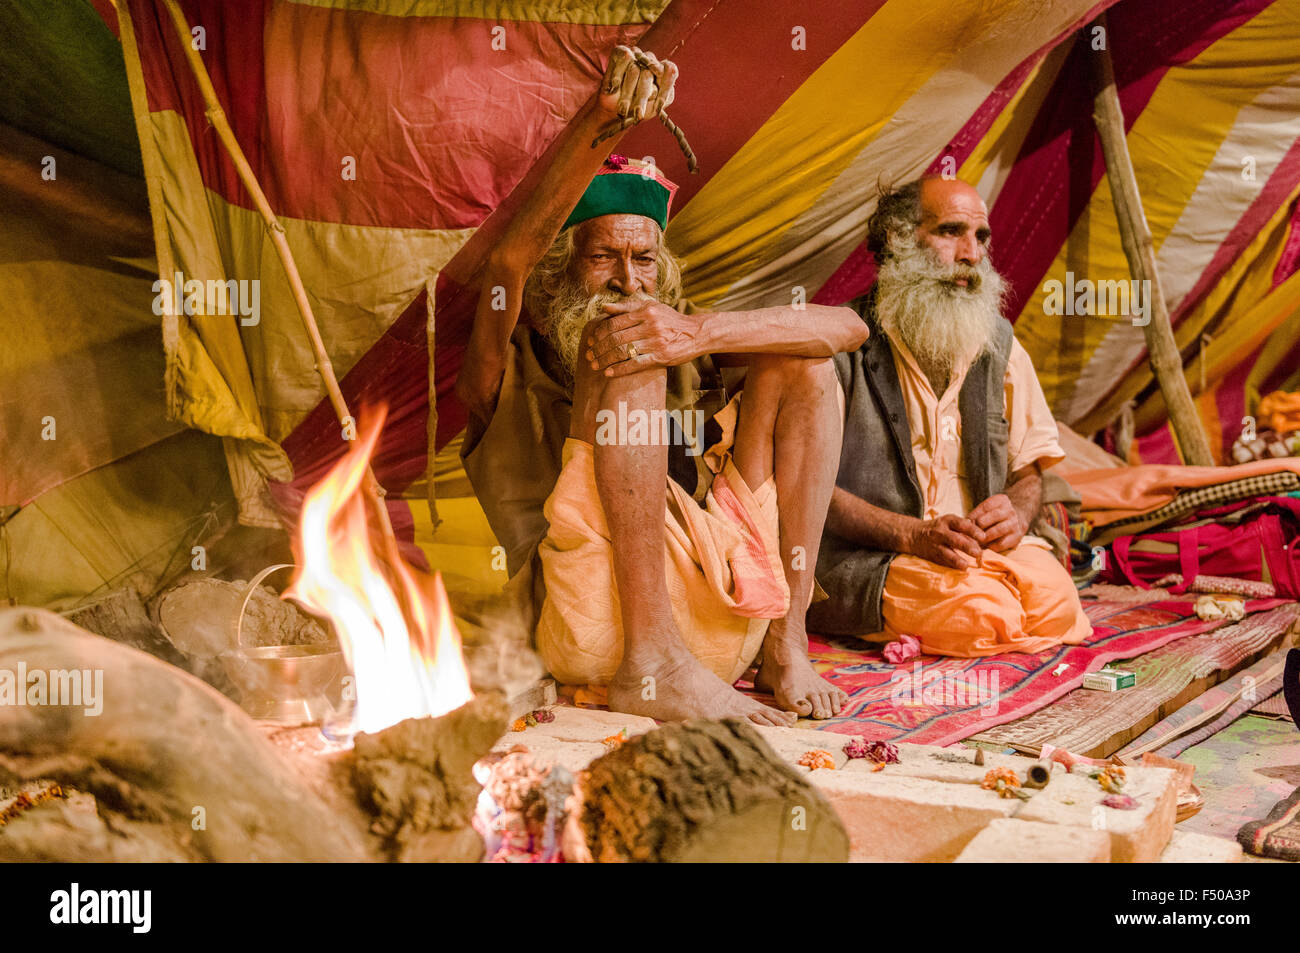 Shiva sadhu from Juna Akhara, holy man, practicing Urdha Tapa, lifting ohne arm for many years for spiritual reason - Stock Image